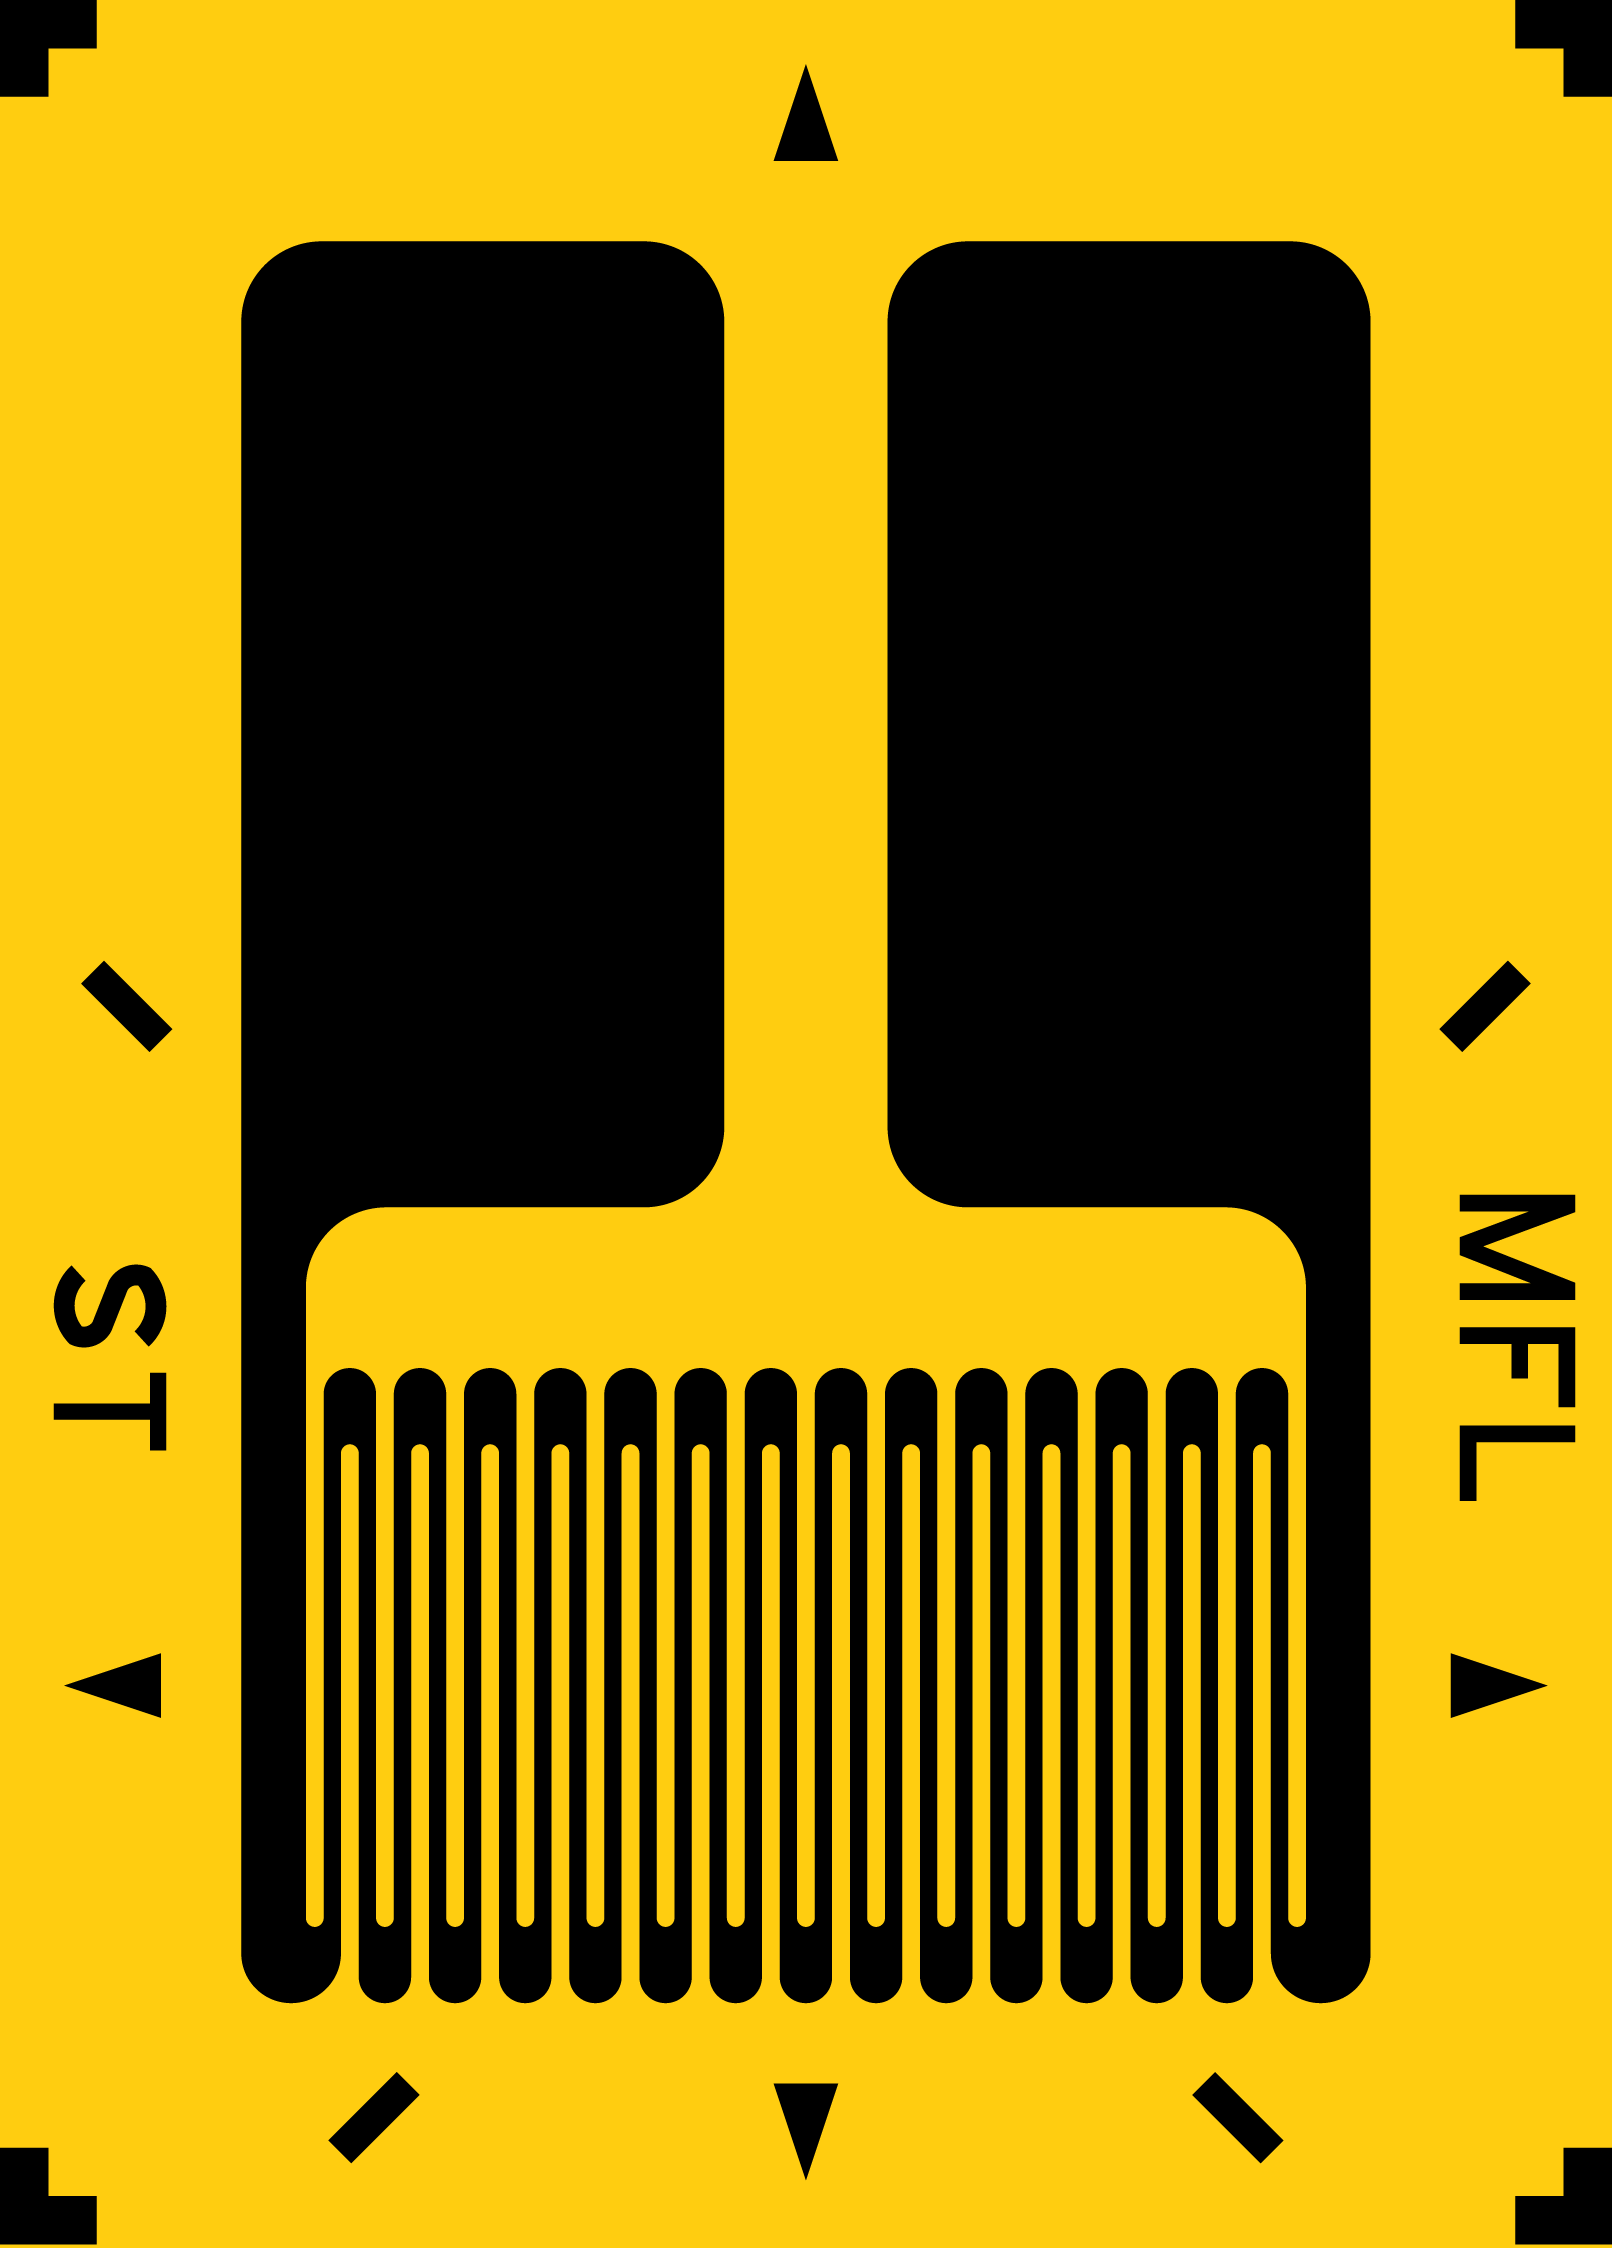 L1-120-ST-XX-Y